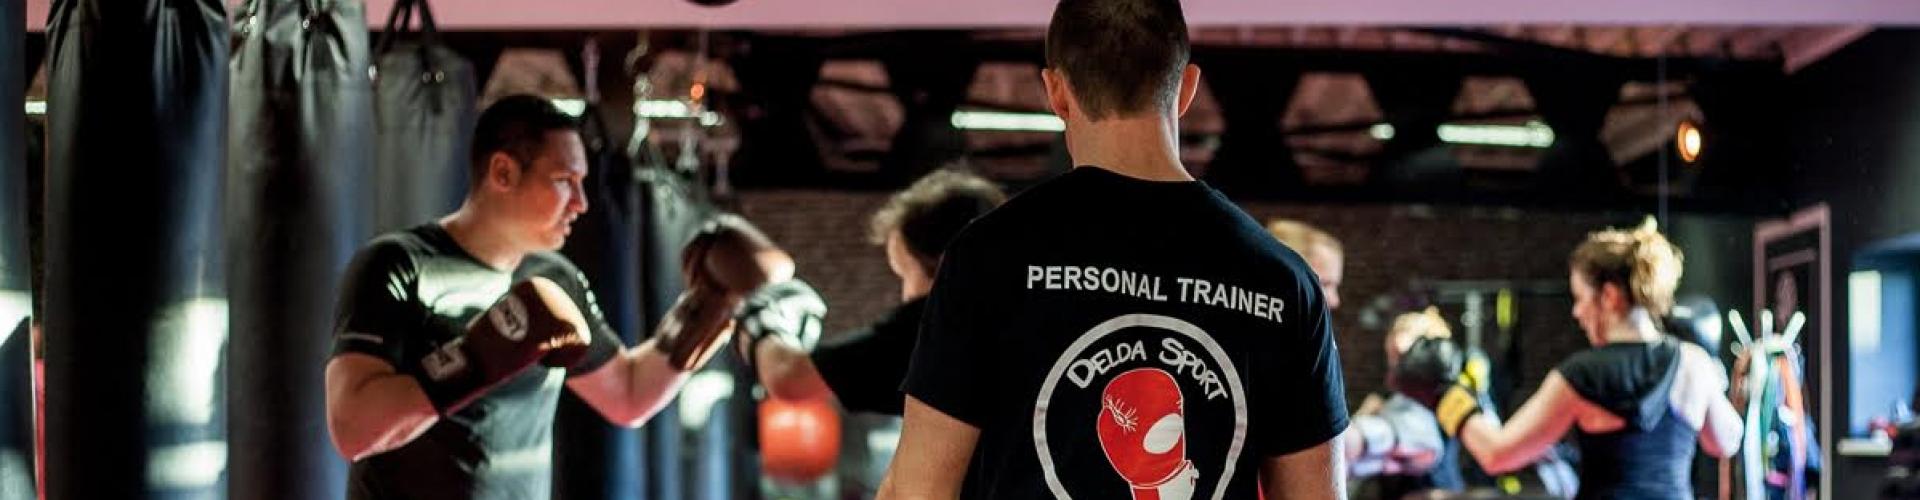 Foto tijdens training bij Delda Sport personal training Amsterdam